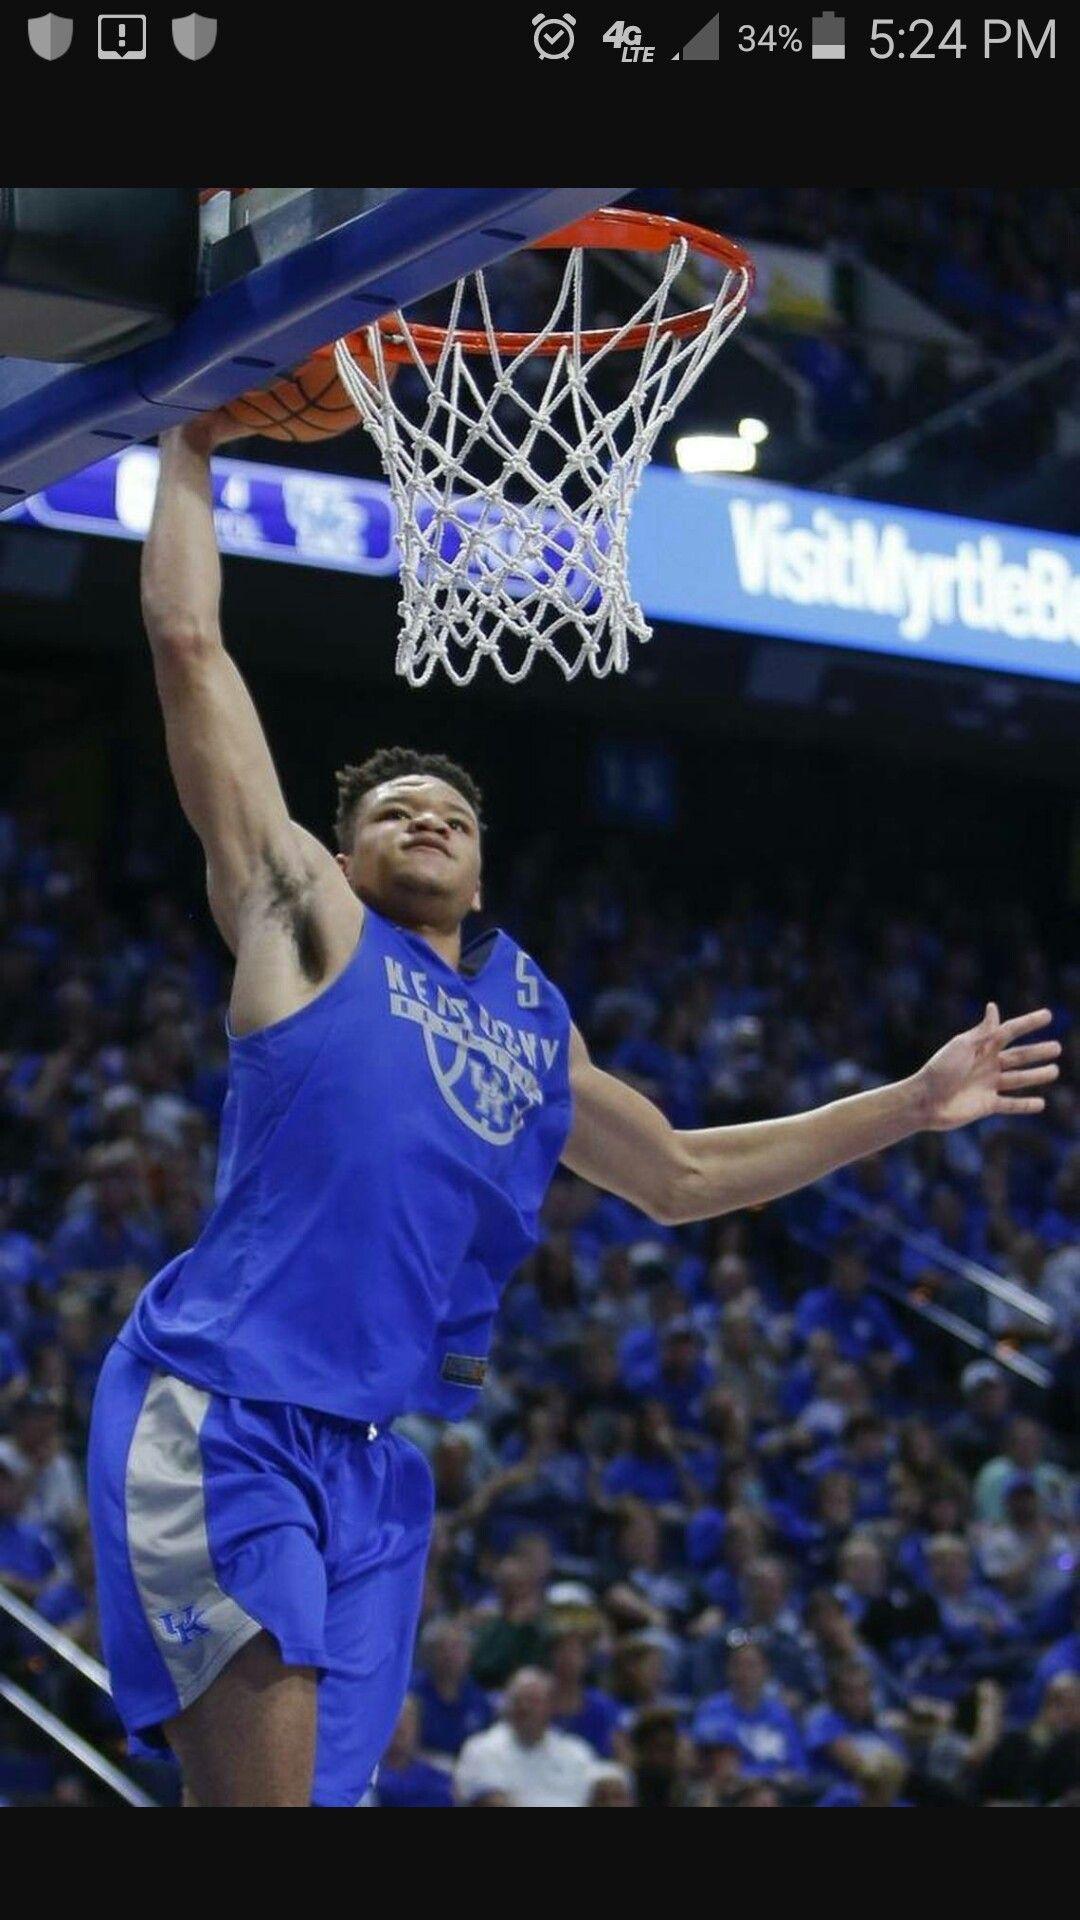 Blue white scrimmage Go big blue, Kentucky basketball